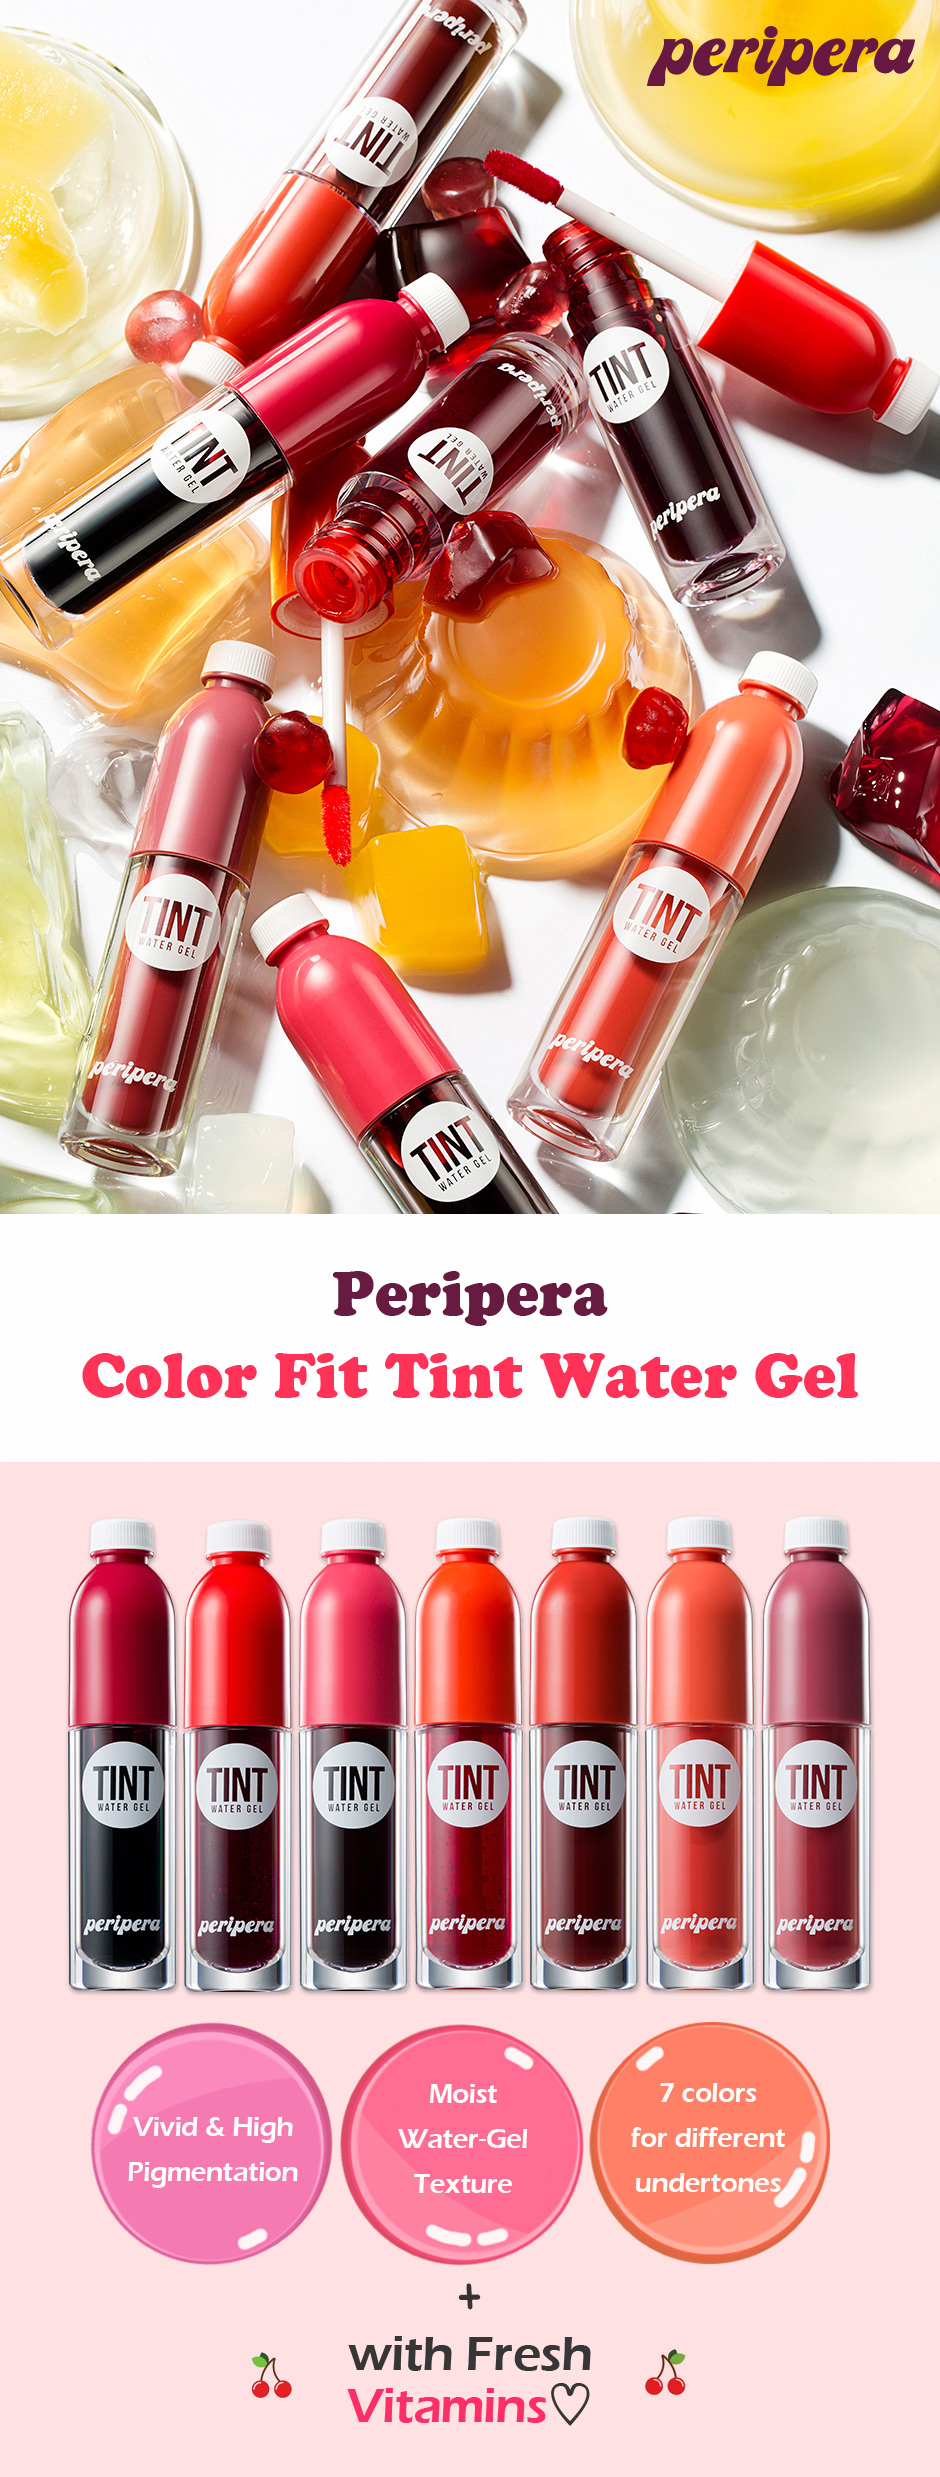 Son Nước Peripera Color Fit Tint Water Gel